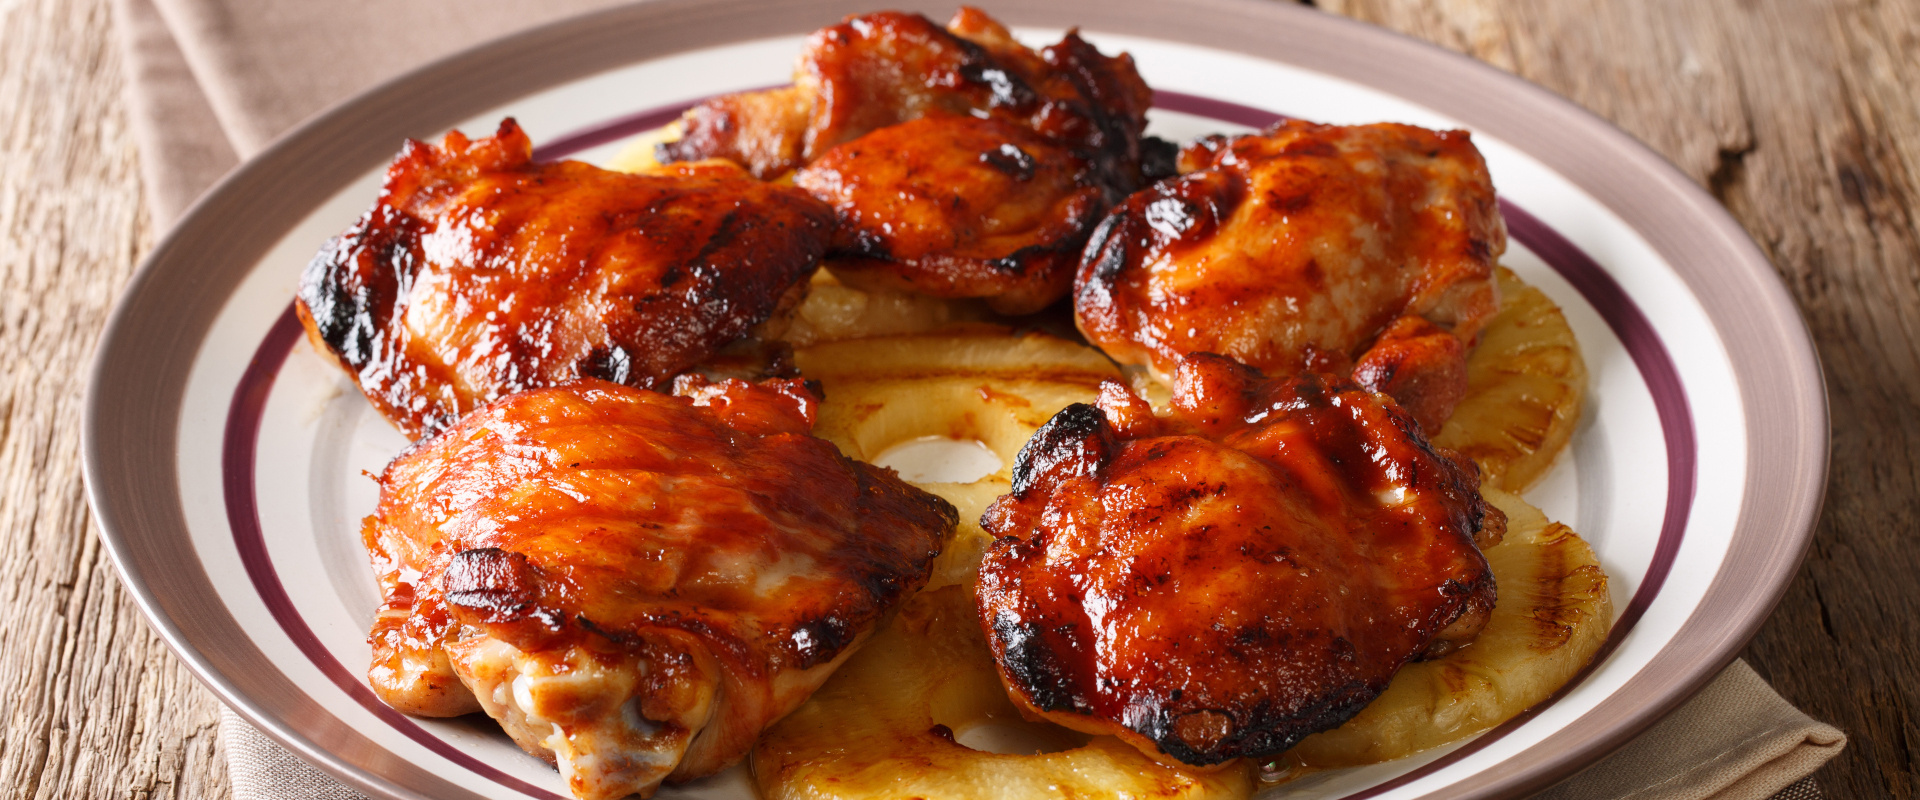 ananászos csirke cover